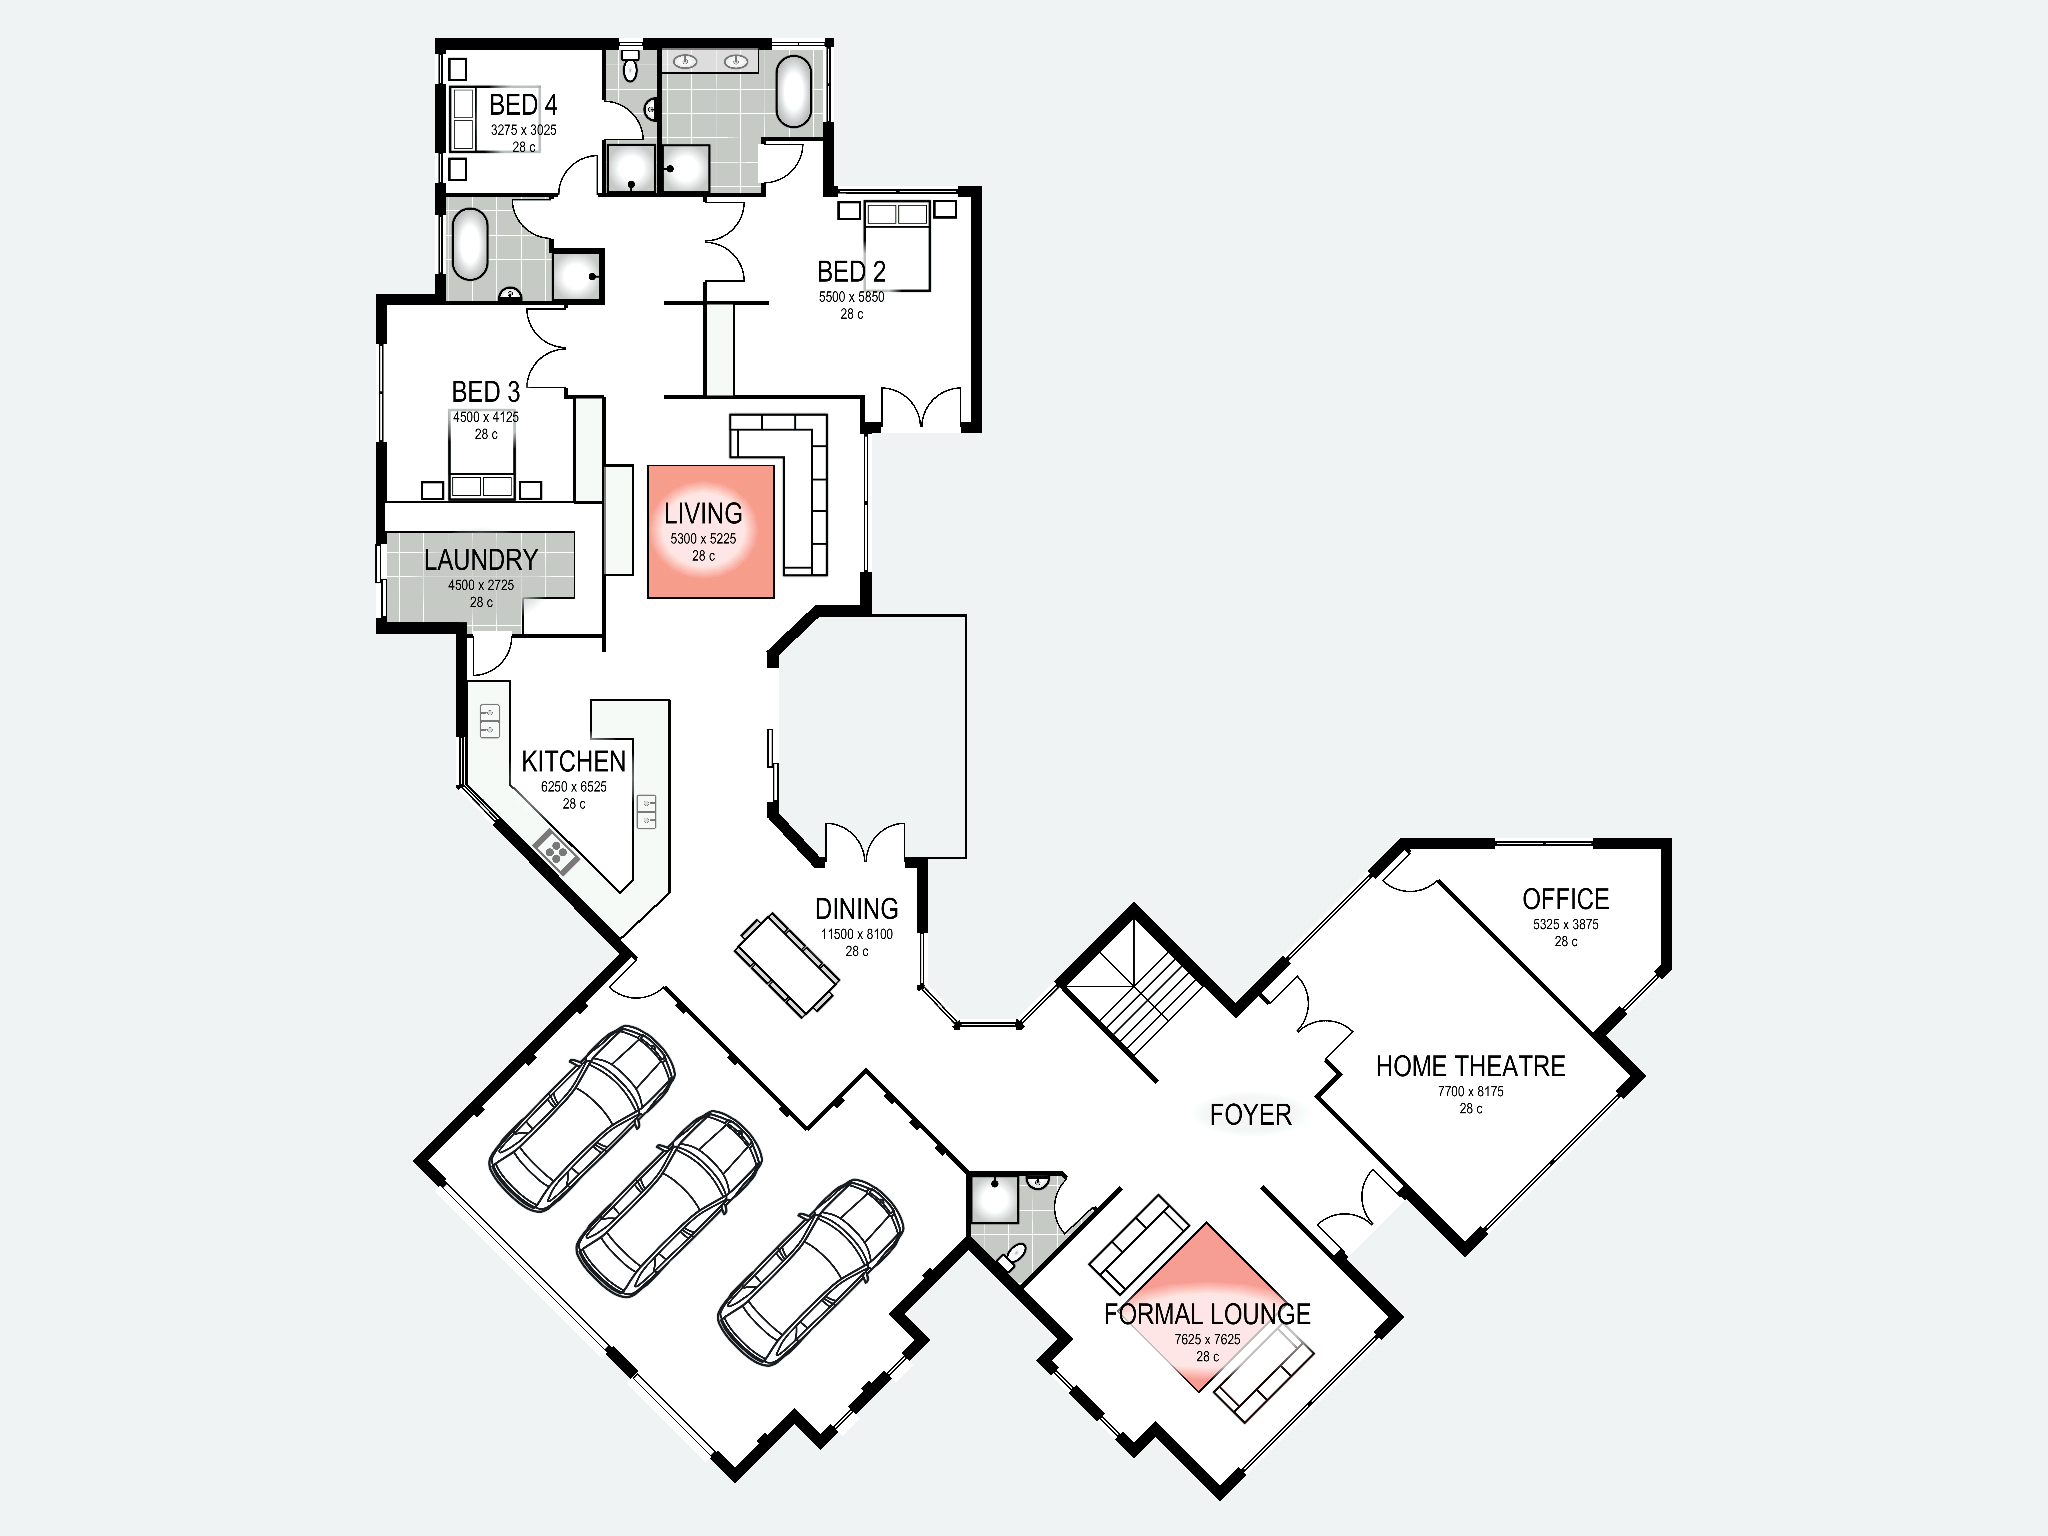 2048x1536 Building Sketch Top Plan Home Decor Clipgoo Bbulding Layout